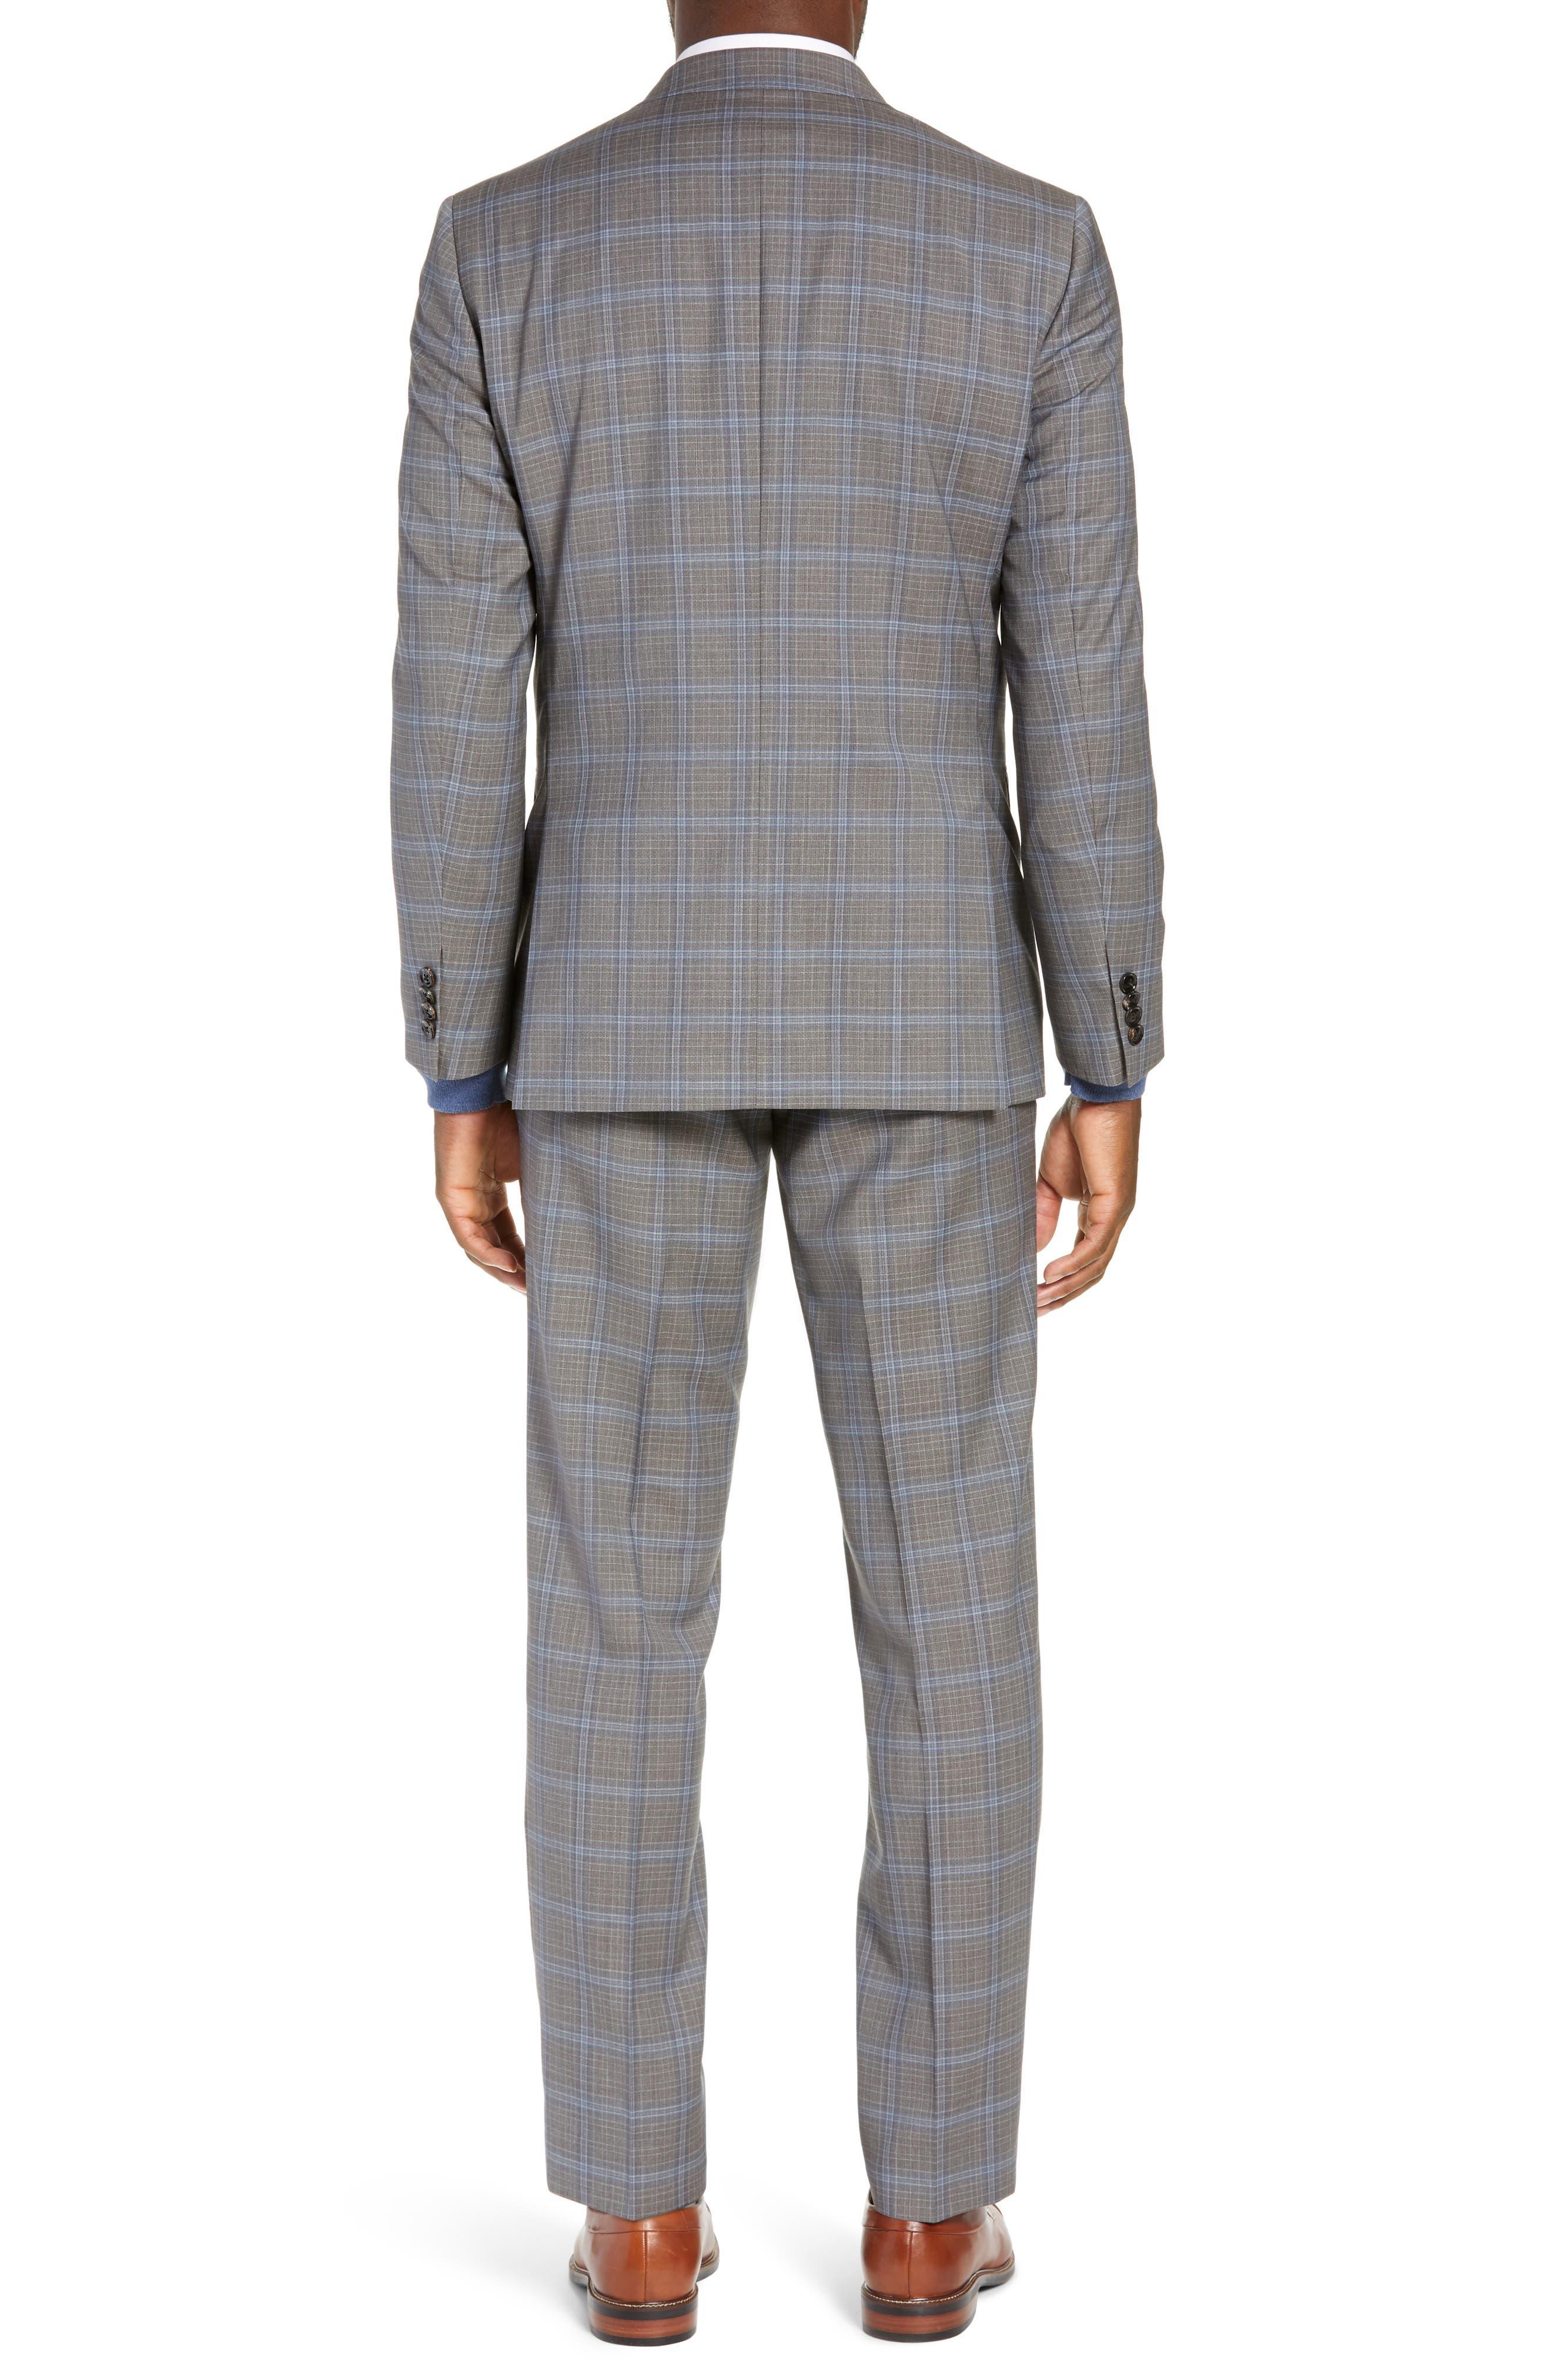 TED BAKER LONDON, Jay Trim Fit Plaid Wool Suit, Alternate thumbnail 2, color, LIGHT GREY